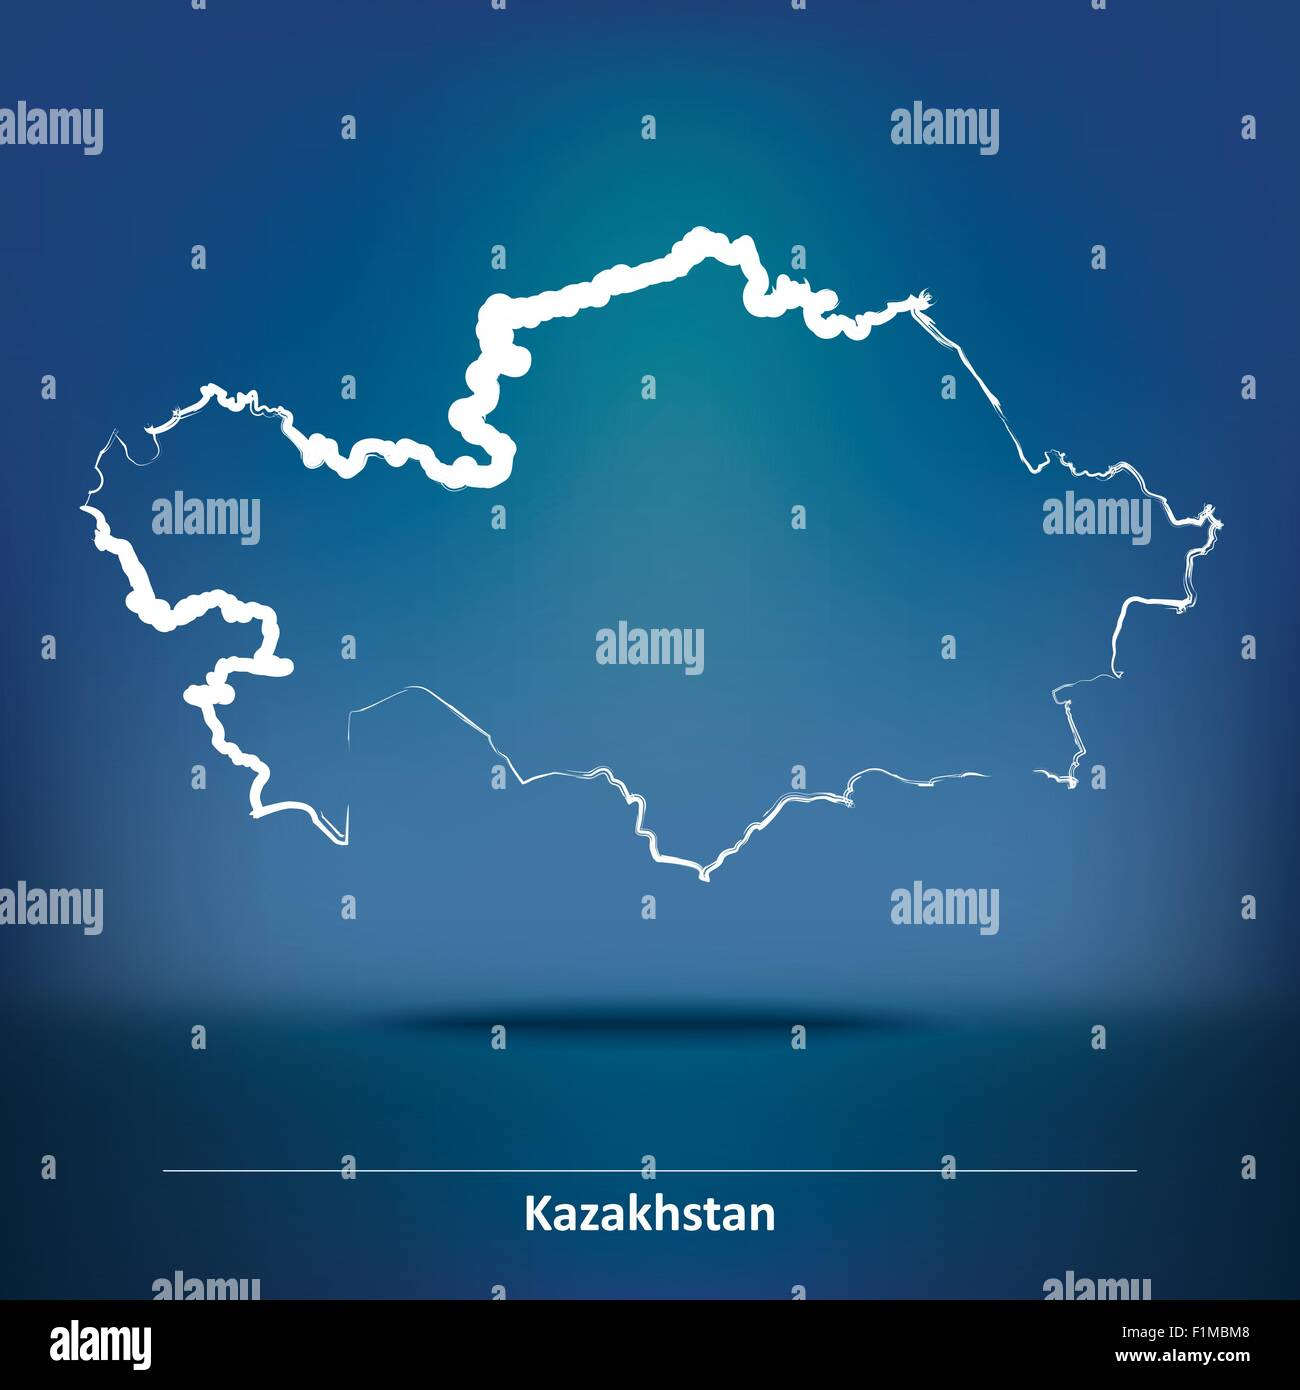 Doodle Map of Kazakhstan - vector illustration - Stock Image